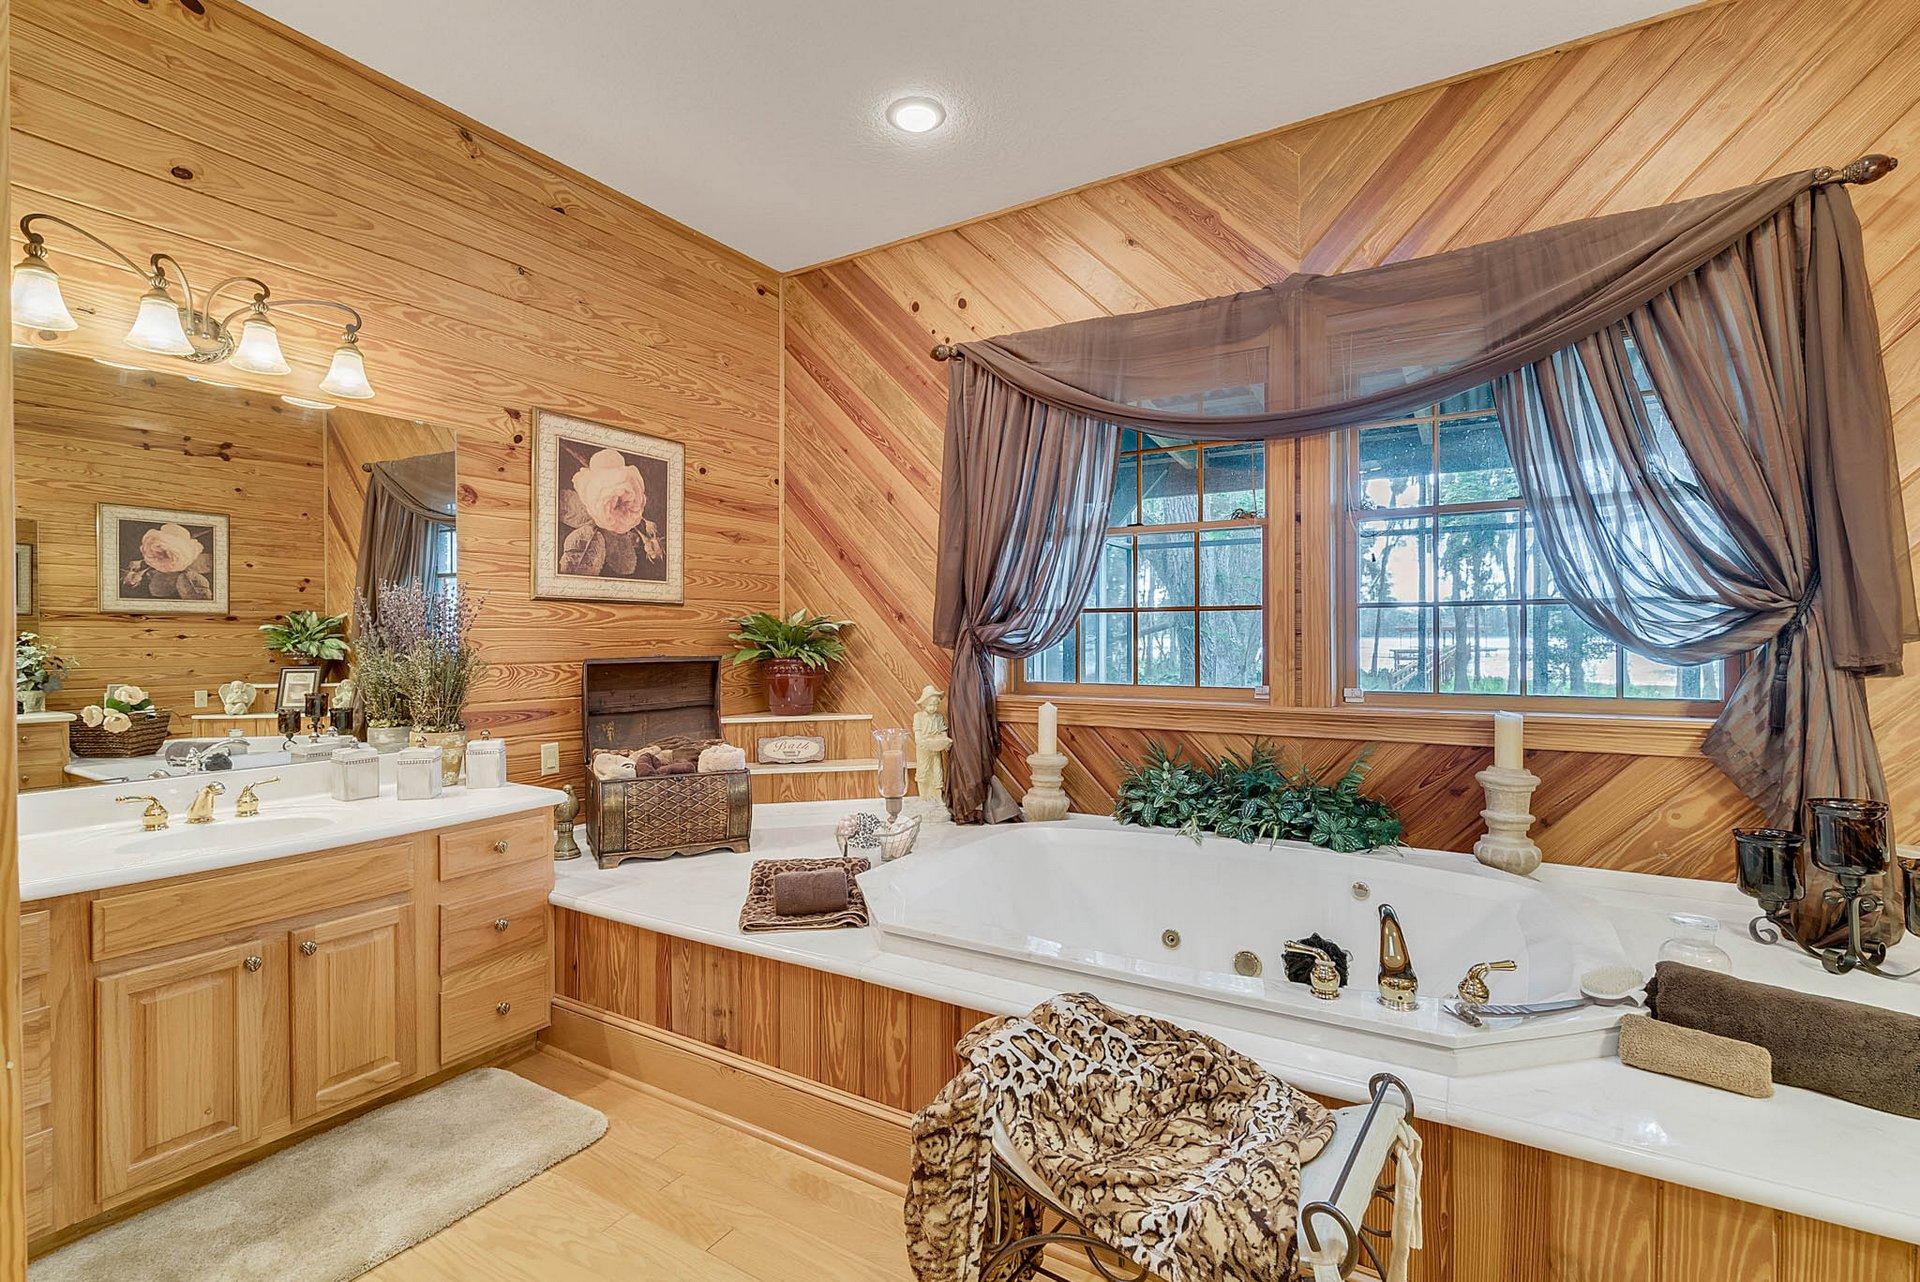 11050-Autumn-Ln--Clermont--FL-34711---25---Master-Bathroom